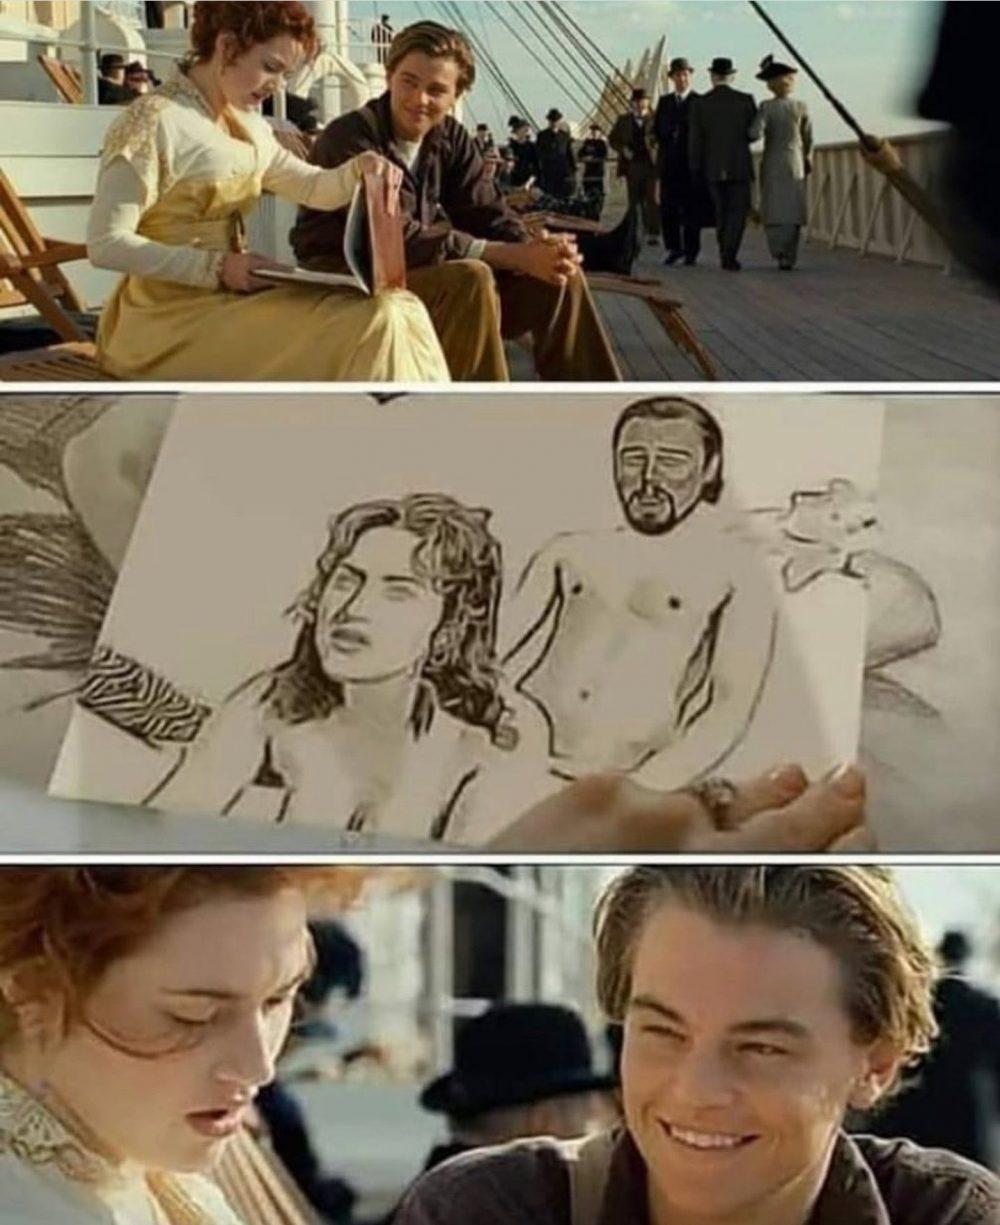 Si el Titanic hubiera zarpado desde Cádiz